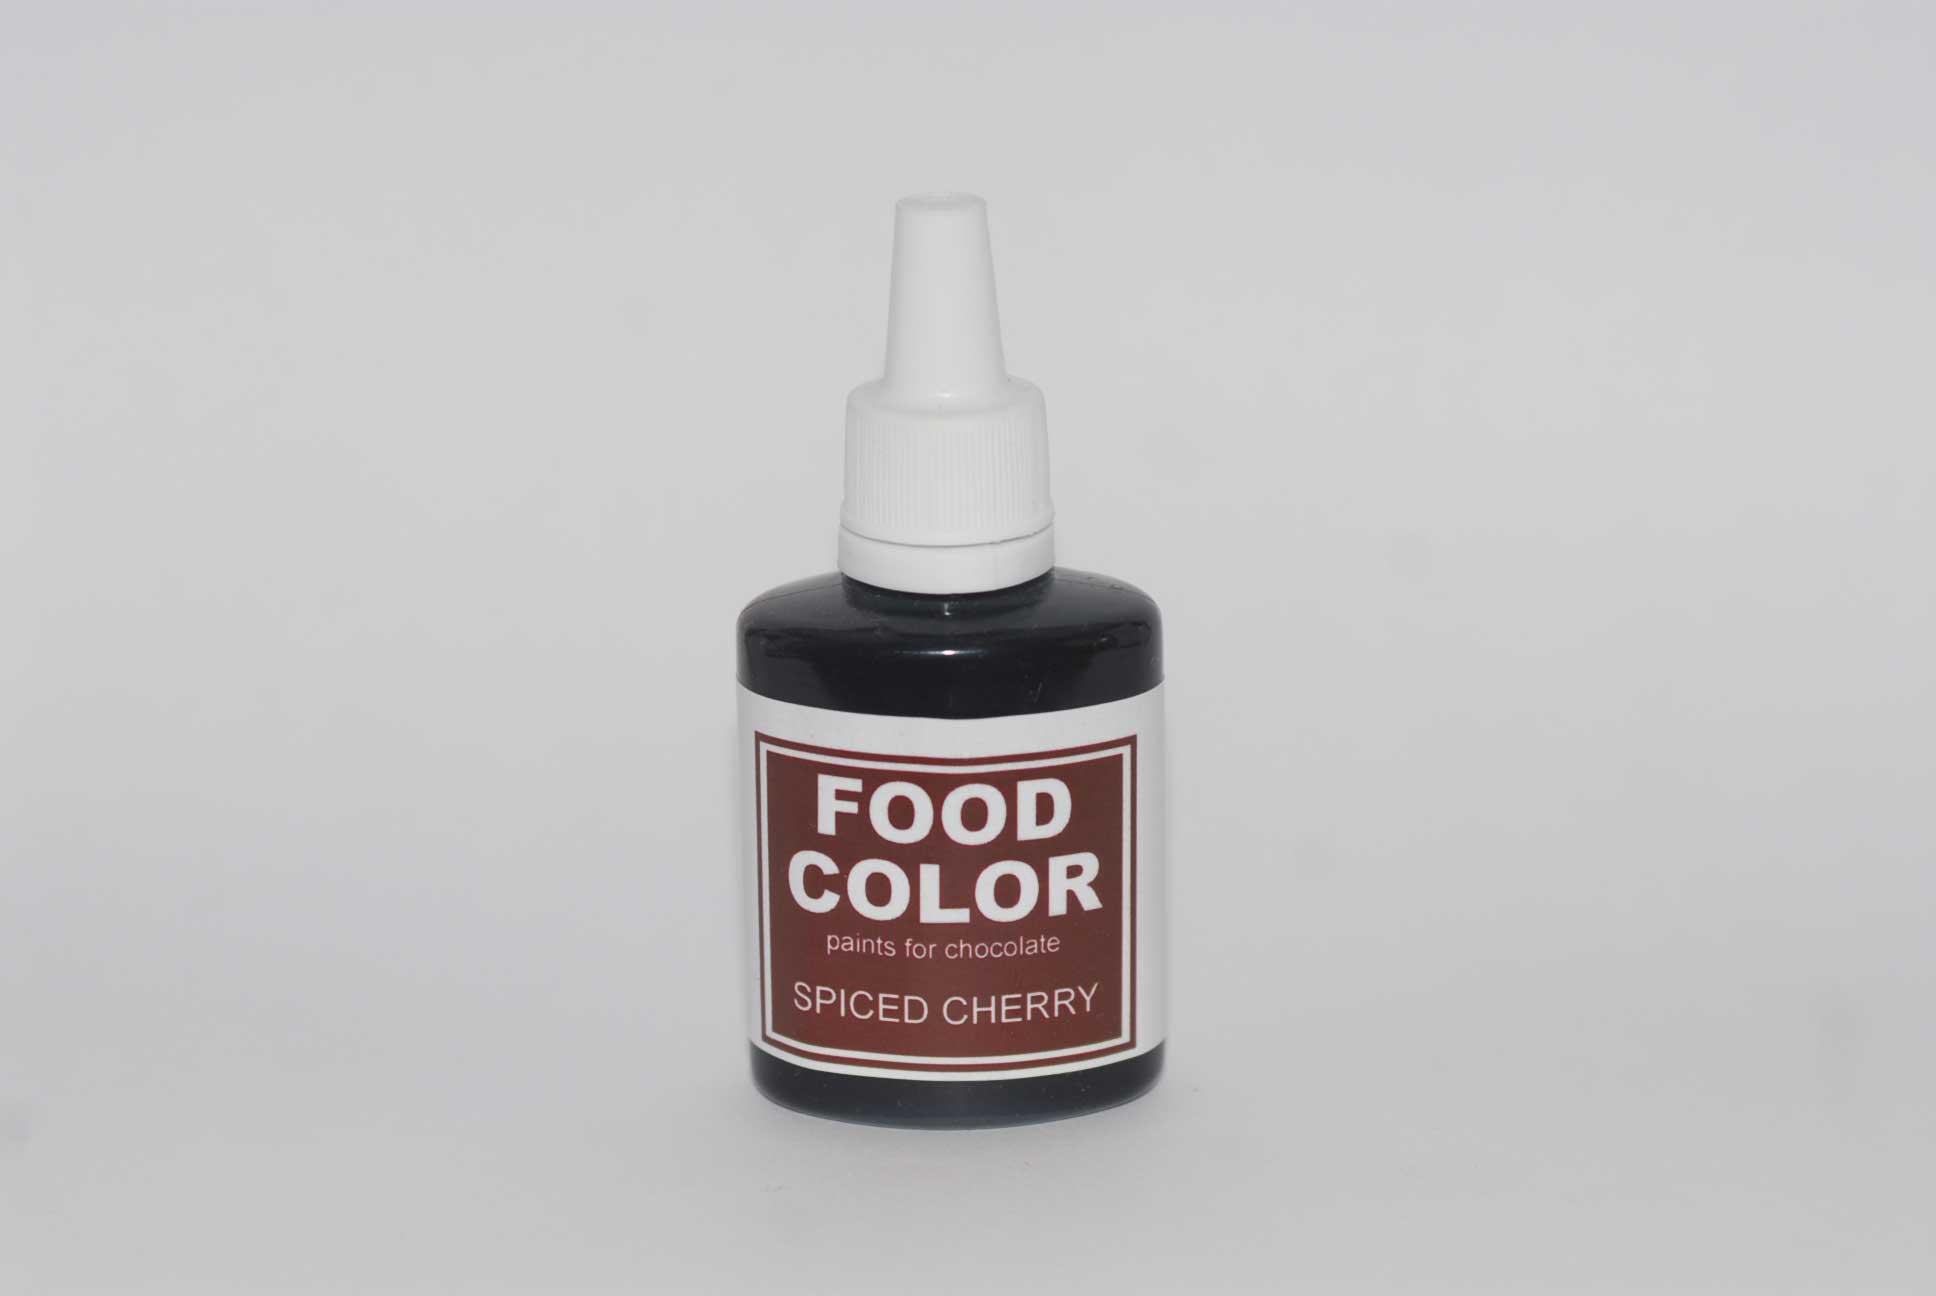 Краситель для шоколада FOOD COLOR Spiced Cherry / Пьяная Вишня, 25 гр